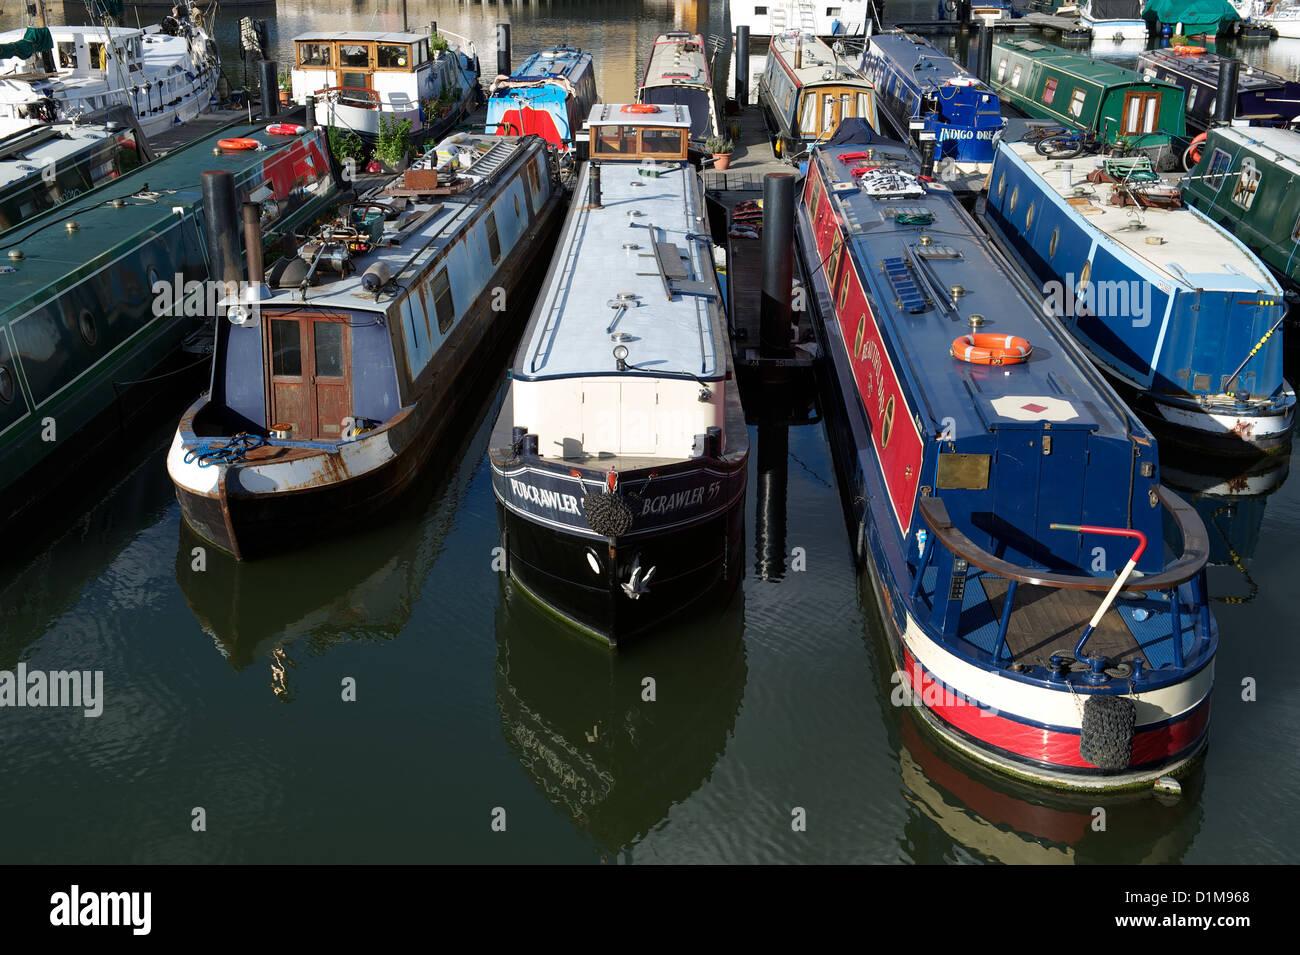 Narrow boats moored in Limehouse Basin, London, UK - Stock Image